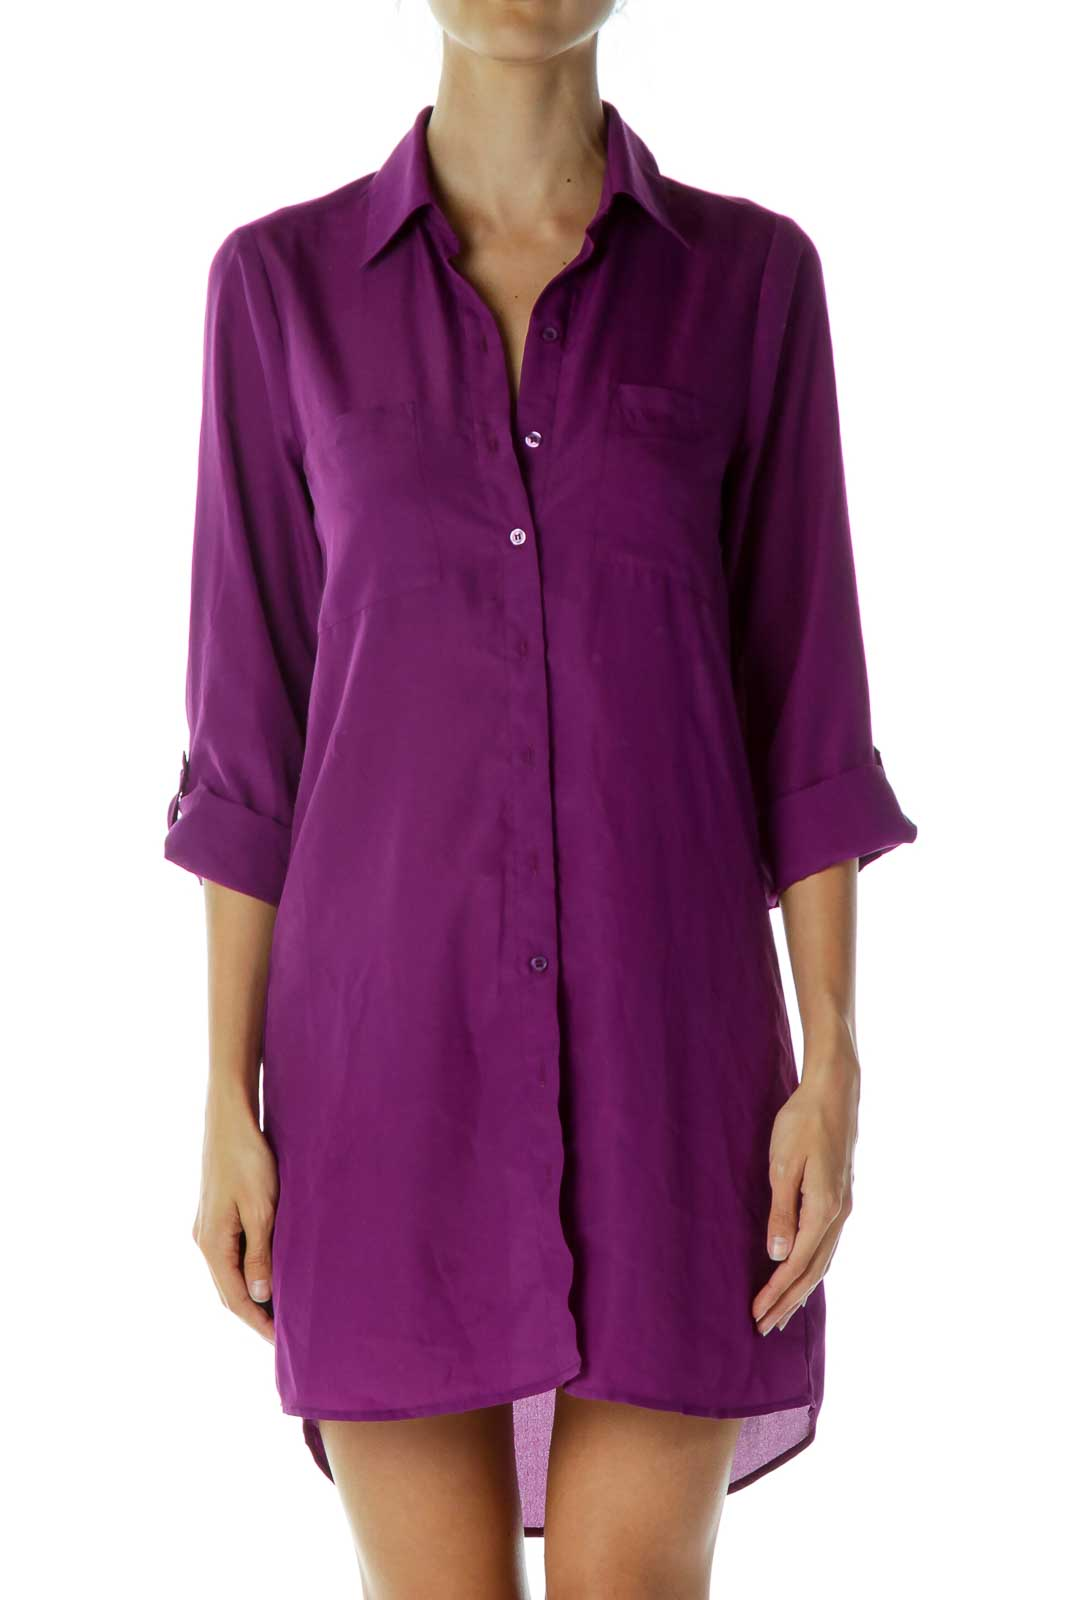 Purple Collared Shirt Dress